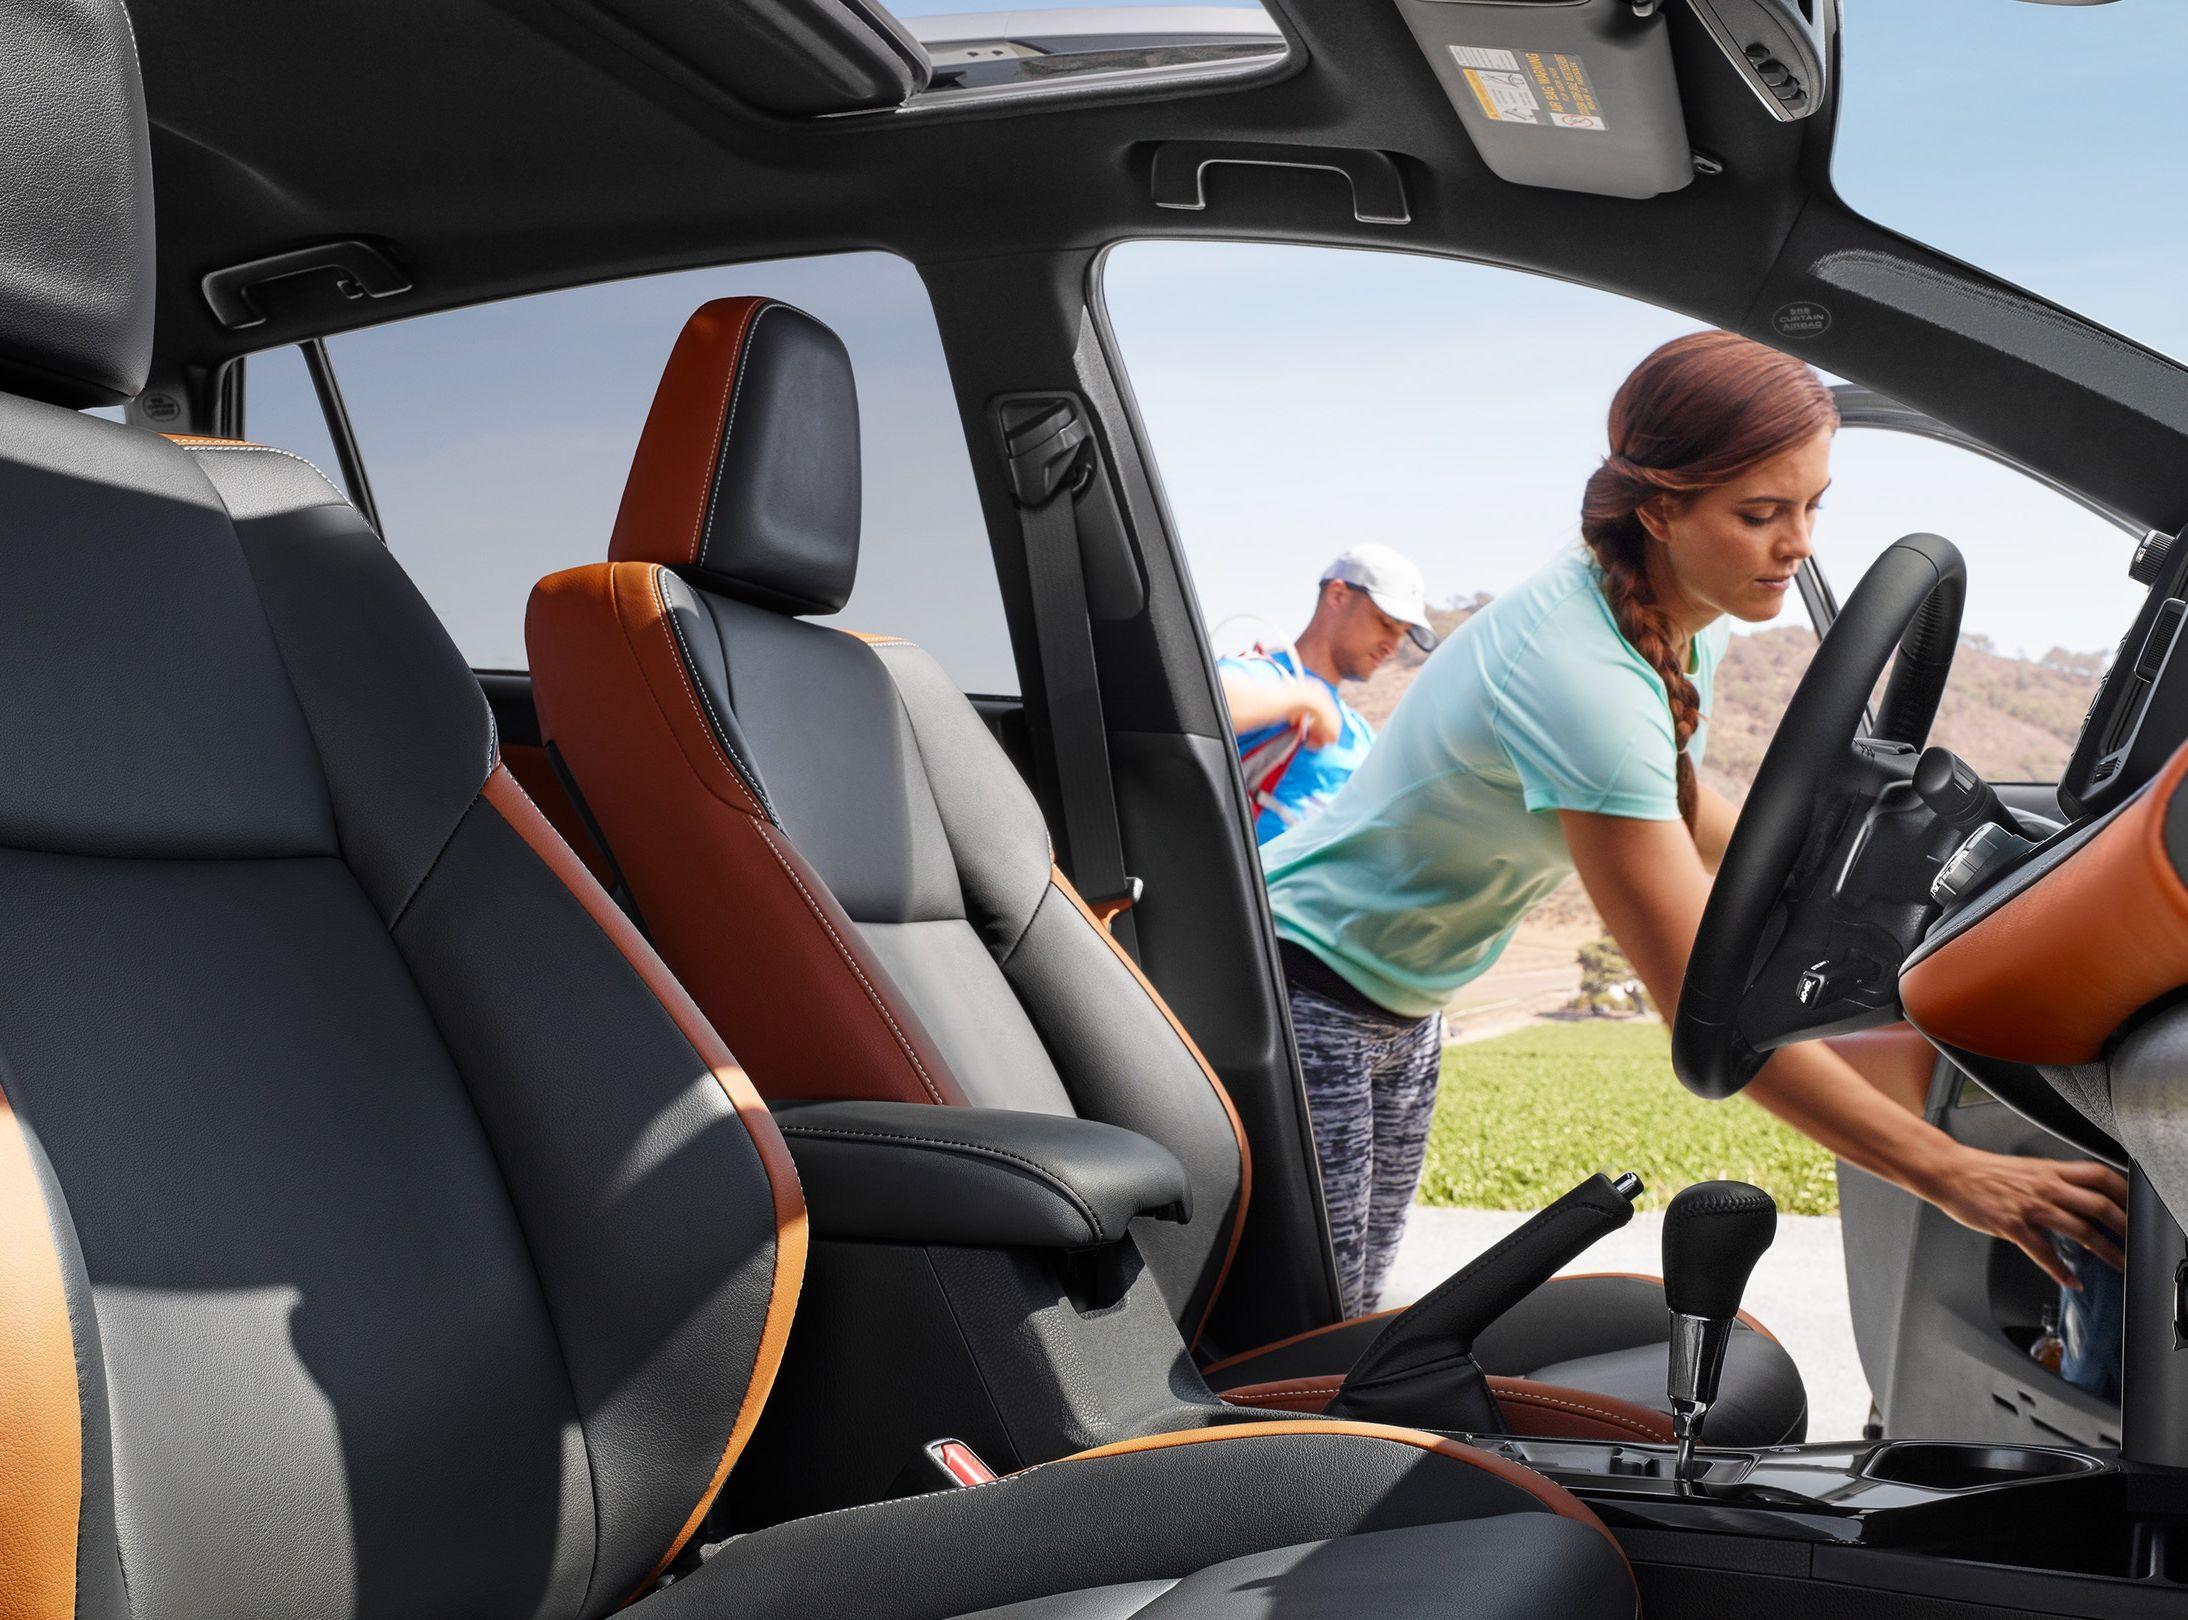 2018 RAV4 Hybrid Seating